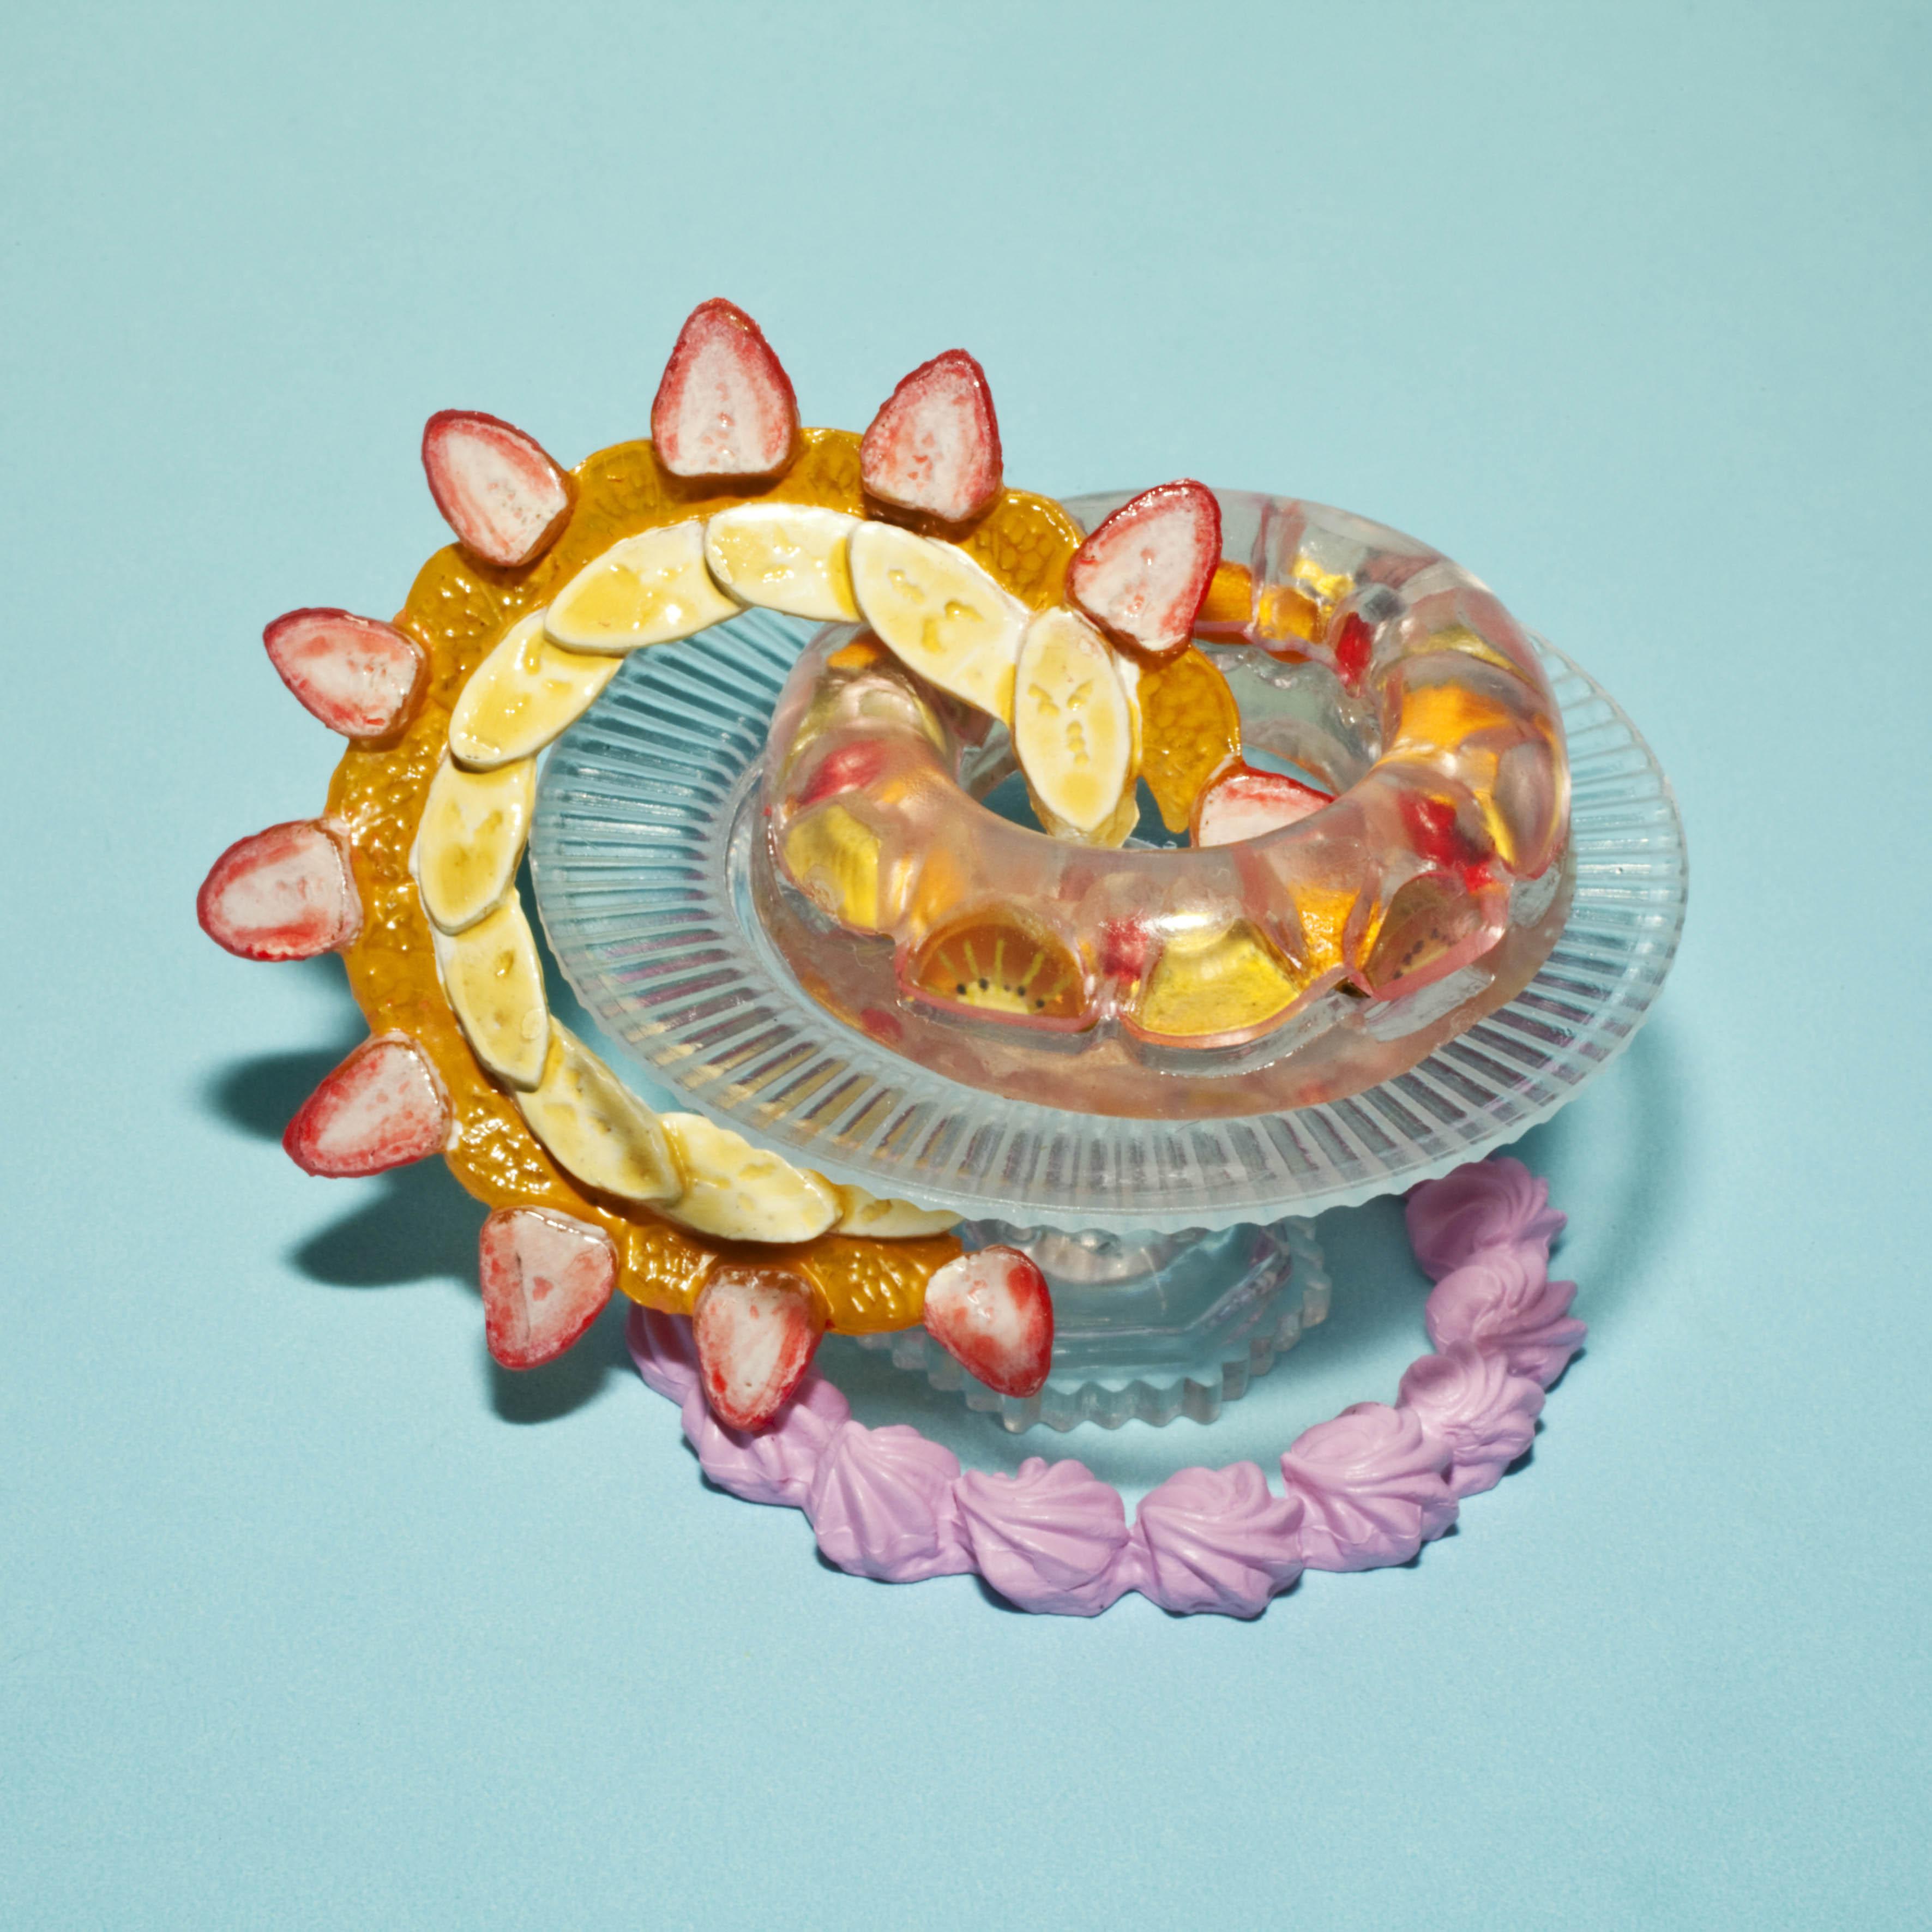 Fotó: Joseph Maida: #jelly #jello #fruity #fruto #thingsarequeer, October 26, 2014 Courtesy the artist